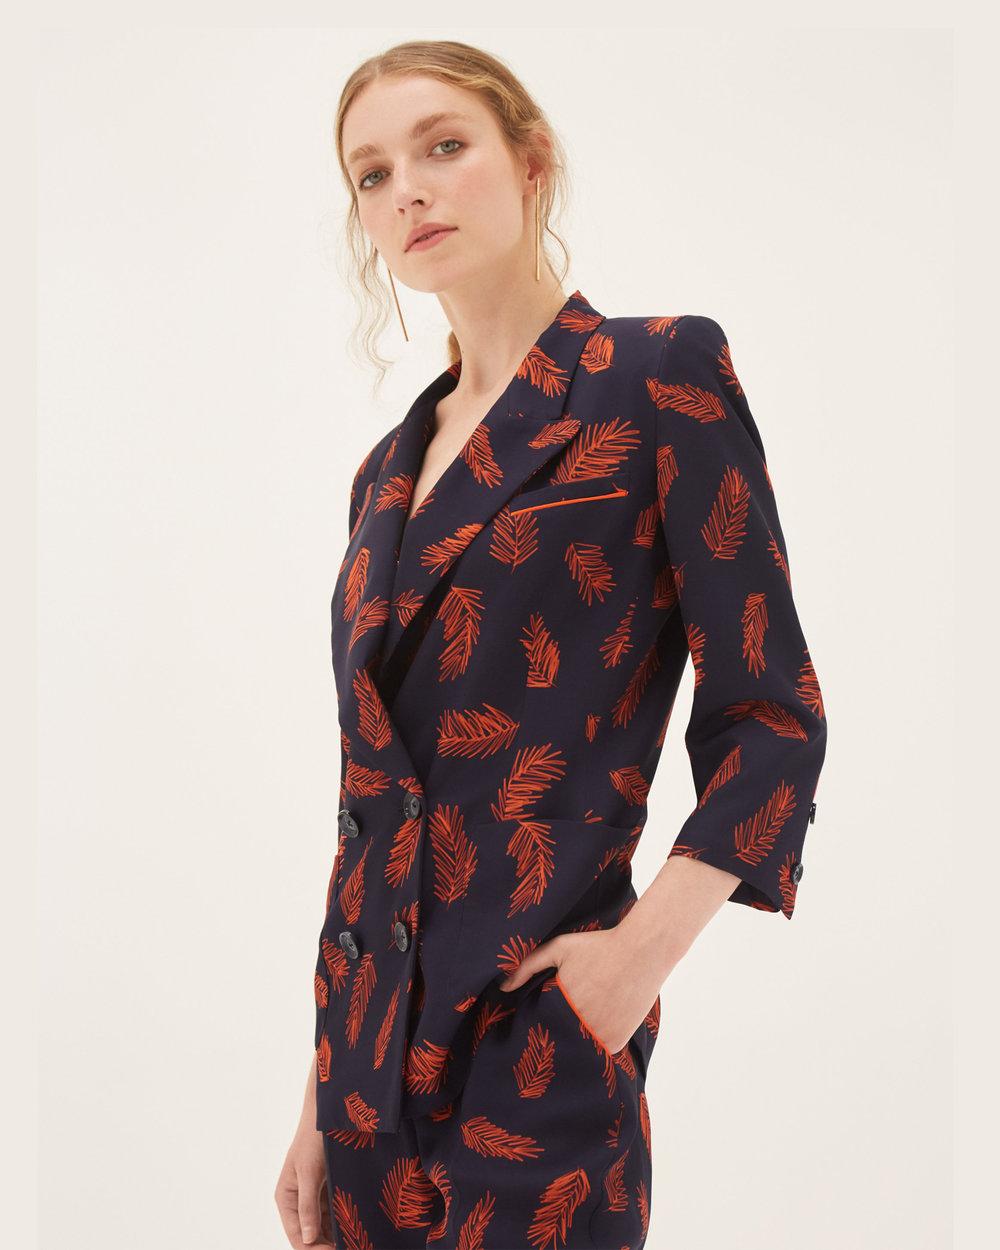 bozena-jankowska-manuka-suit-detail.jpg